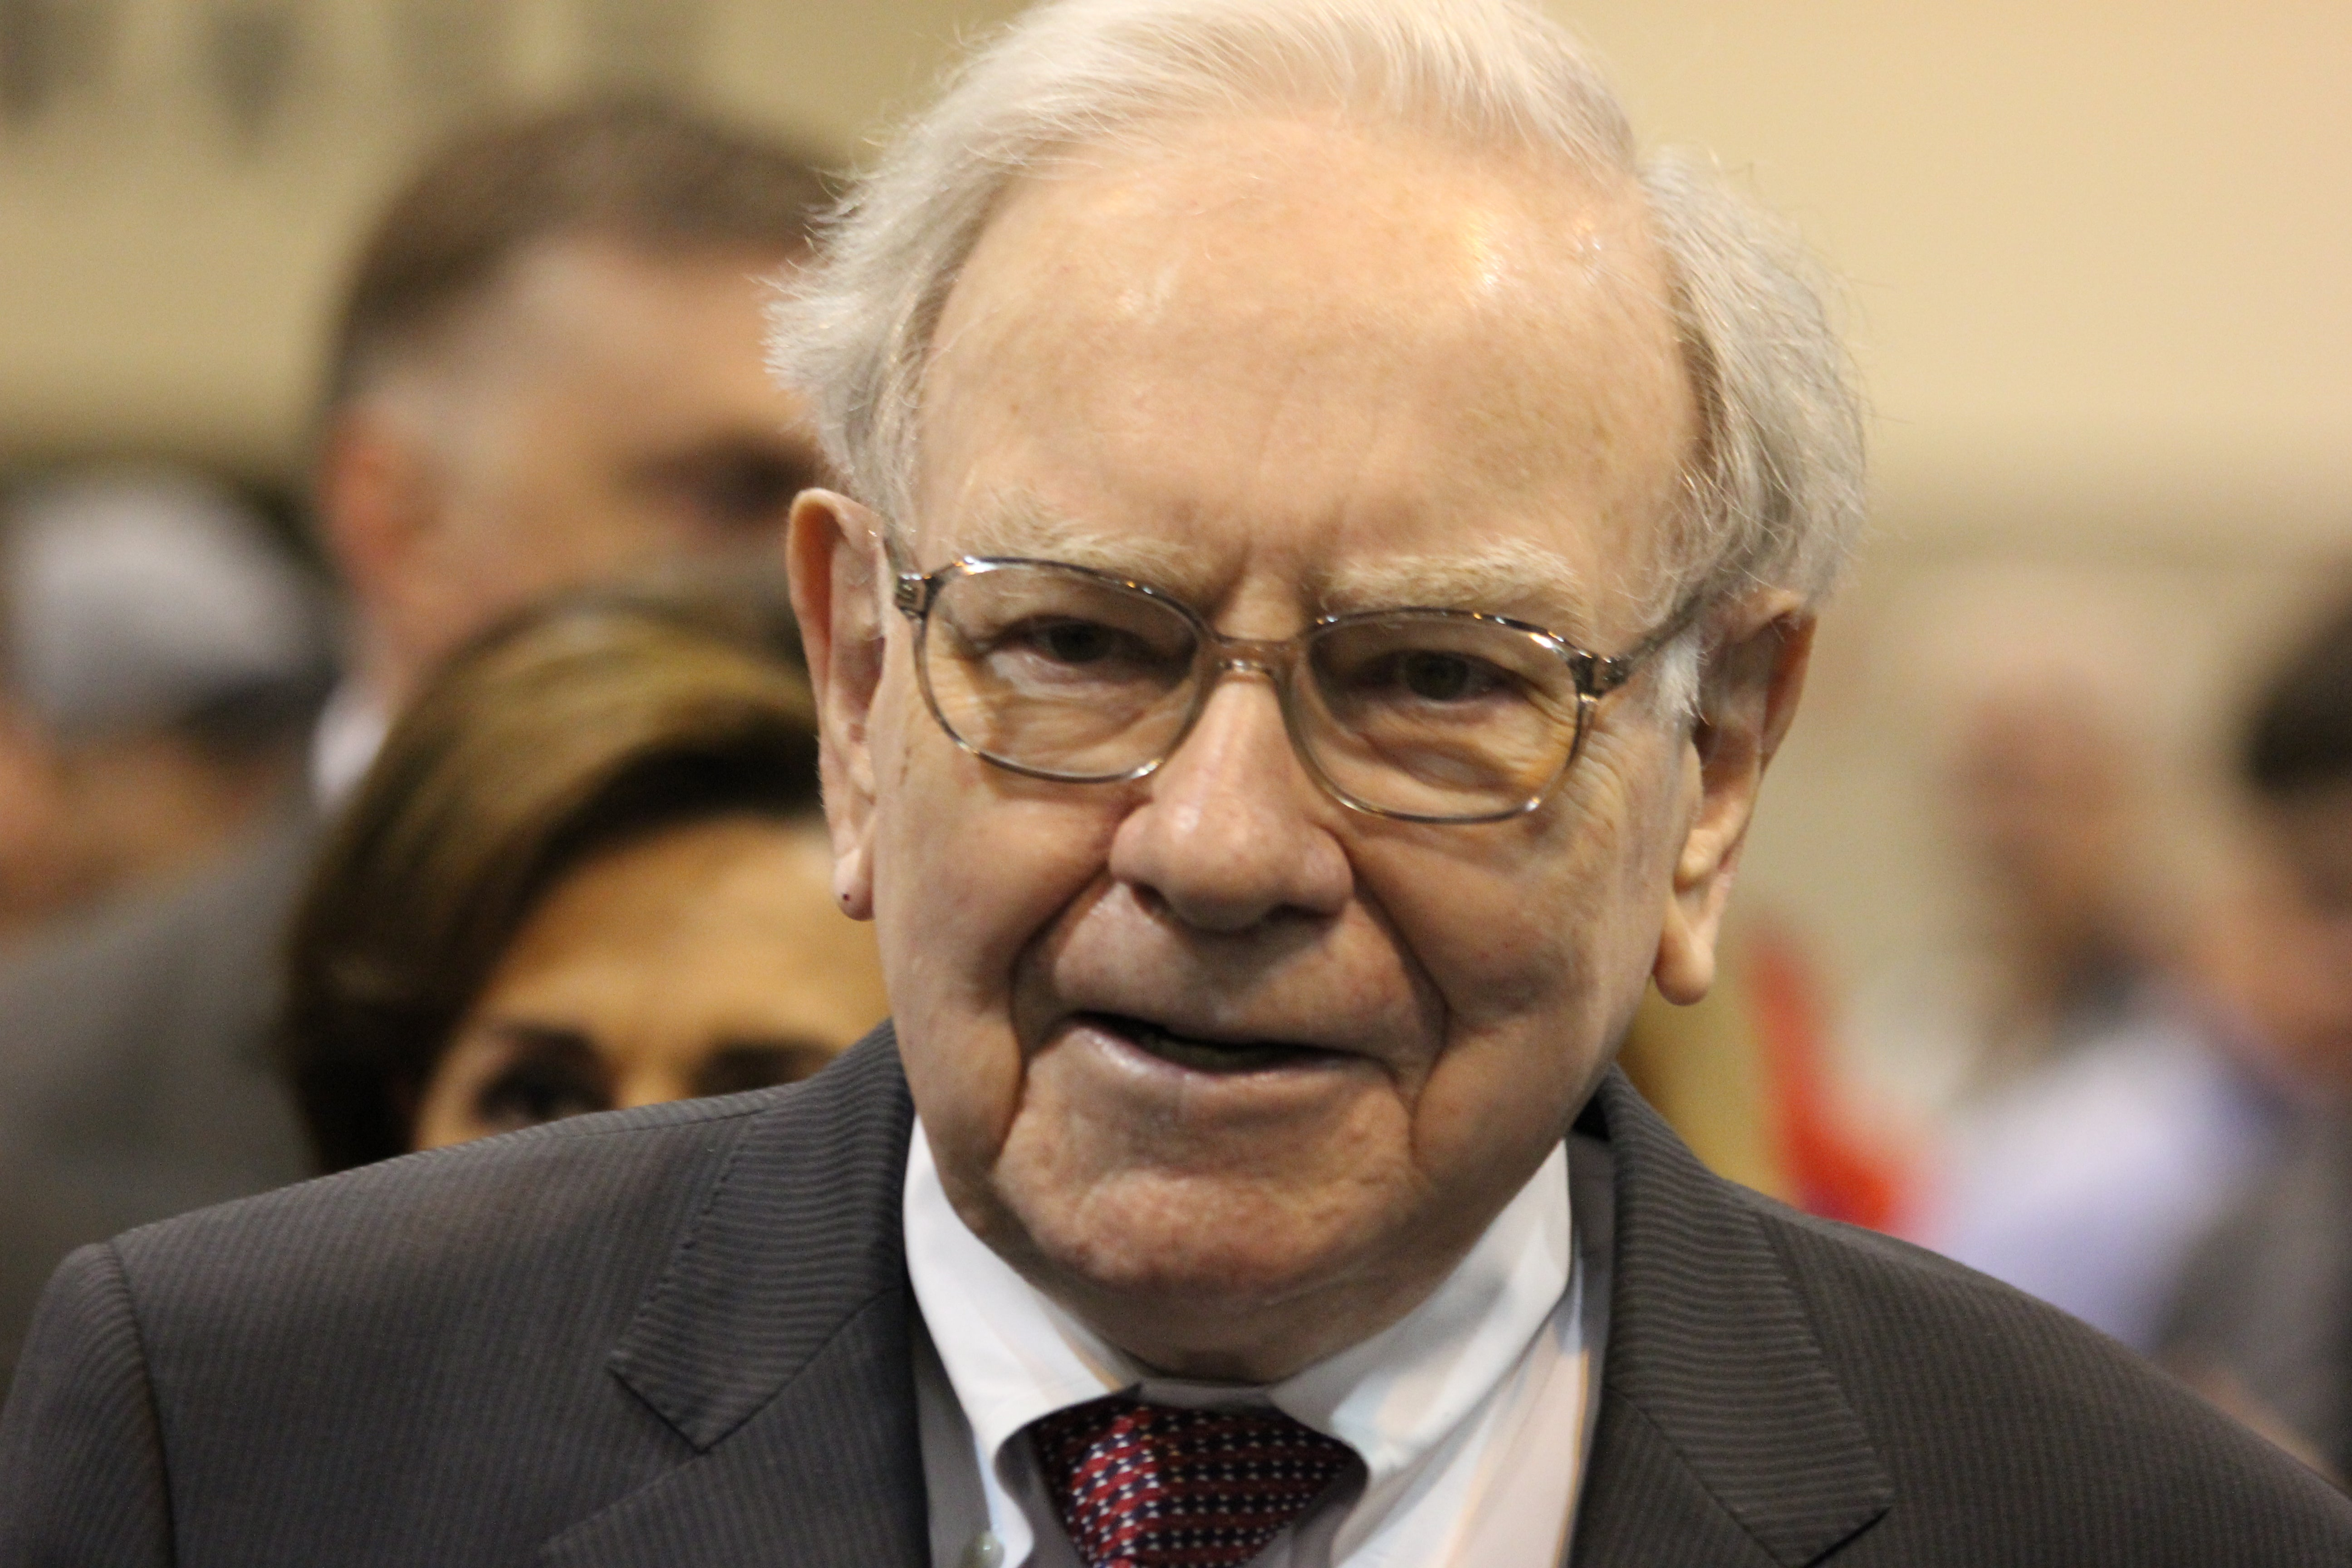 3 Reasons I Just Bought More Berkshire Hathaway Stock | The Motley Fool